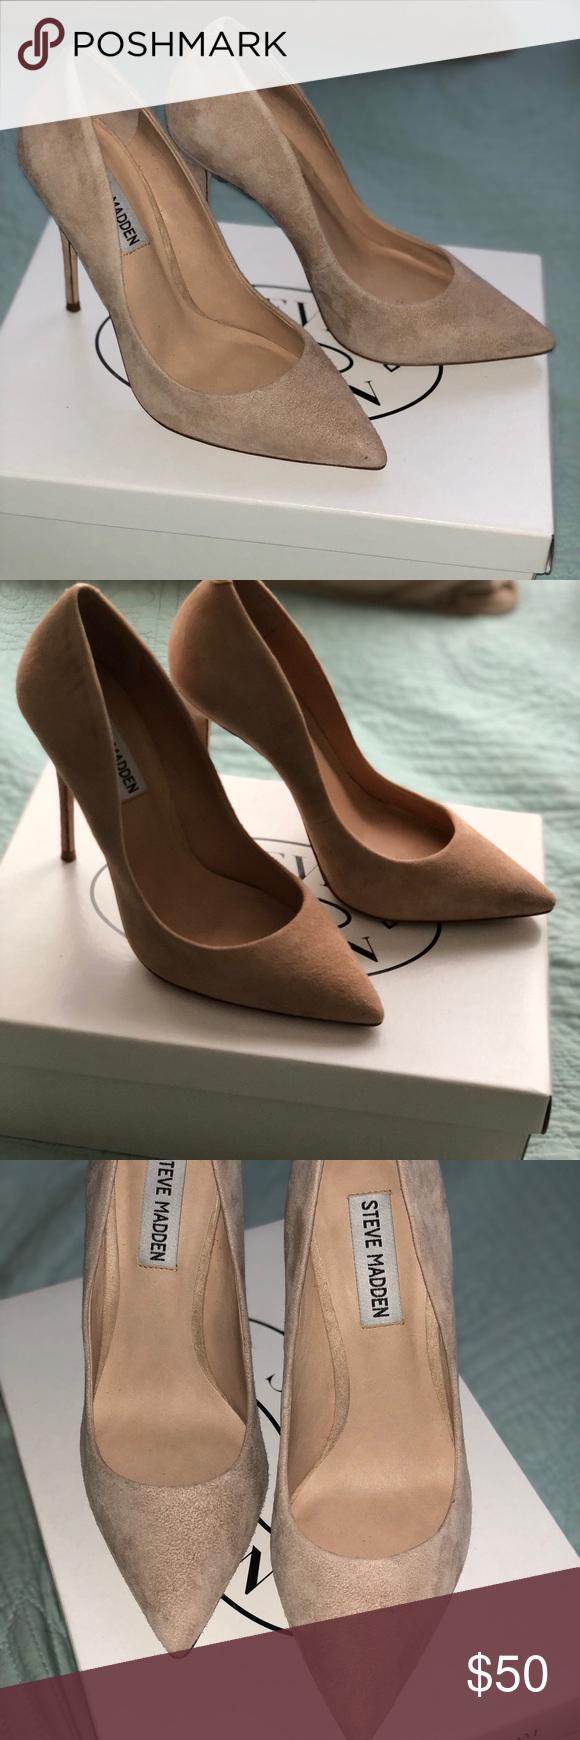 9931bb86a7a Steve Madden blush DAISIE heels Gorgeous Steve Madden DAISIE heels ...